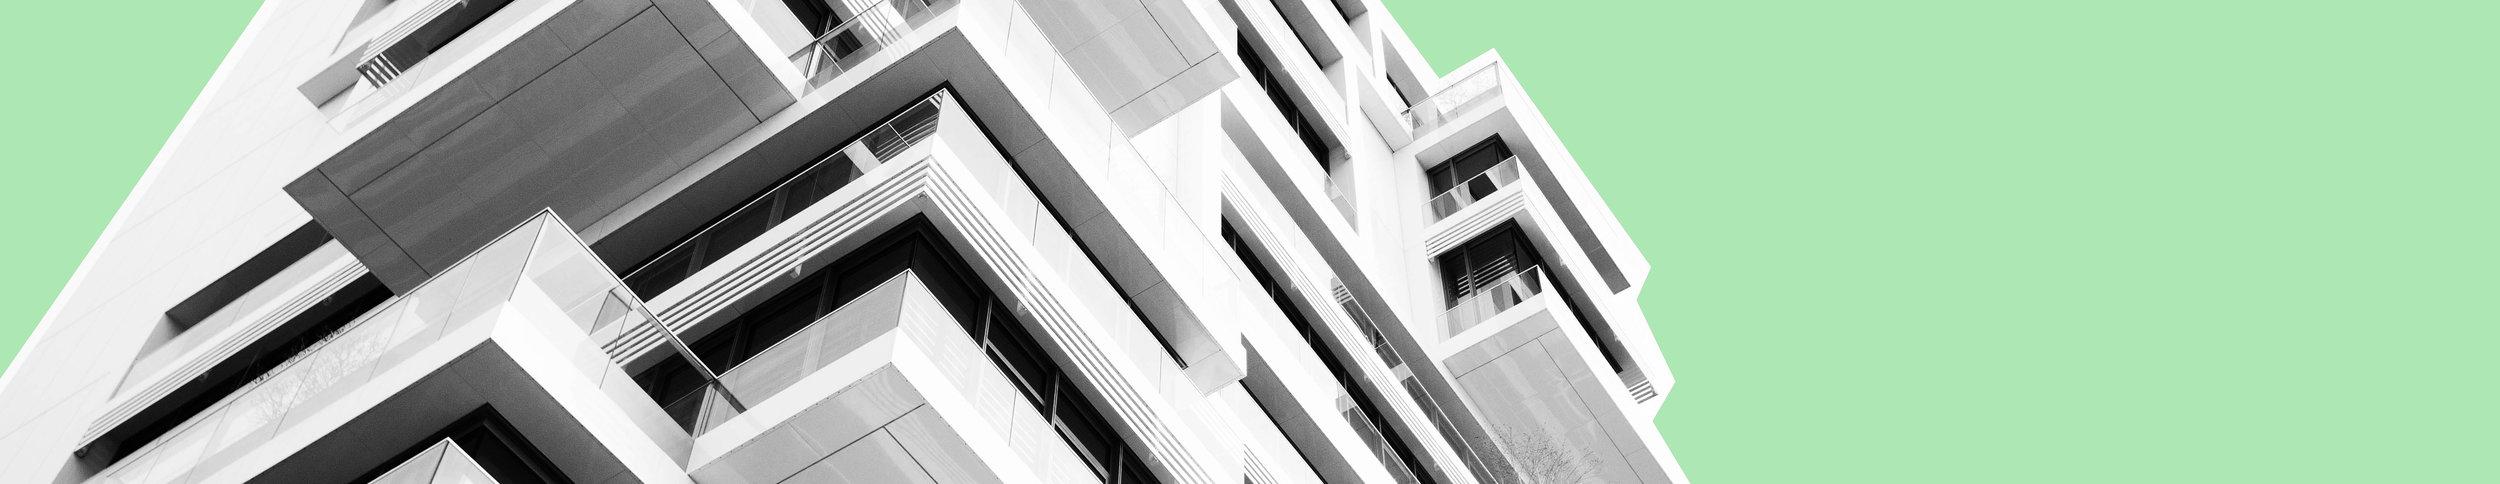 studio fresia architettura consulenze energetiche architettura mondovì  geometri edilizia servizi architettura piemonte.jpg.jpg